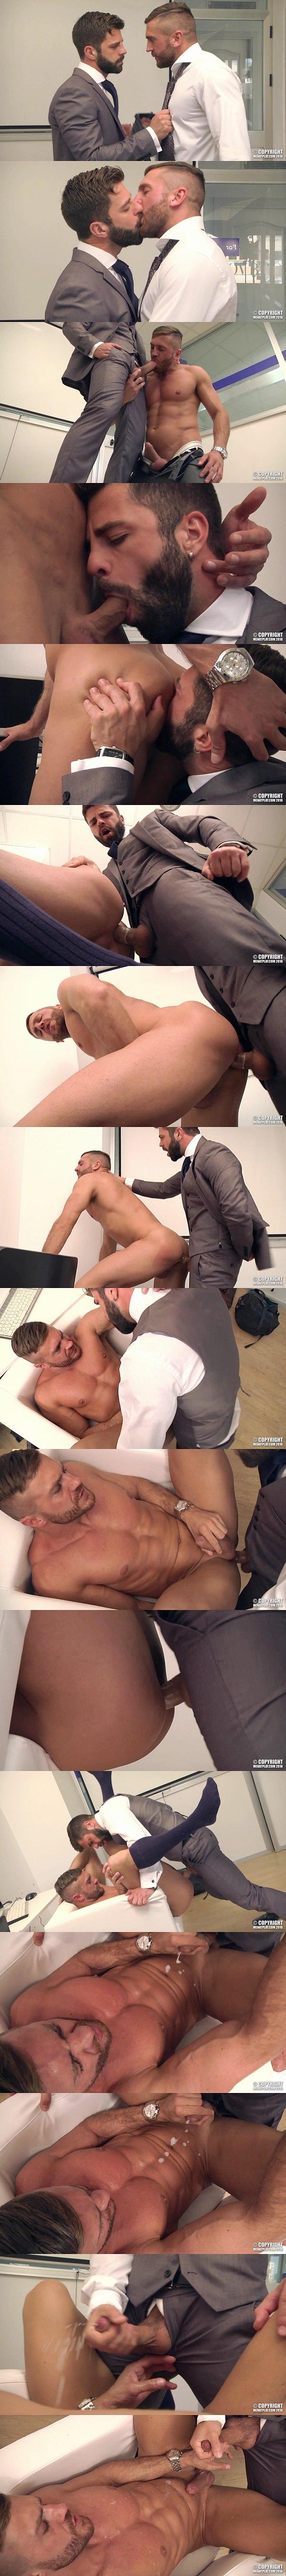 Hector De Silva fucks former Big Brother contestant Emir Boscatto's tight virgin ass in The Book Buff at Menatplay 02